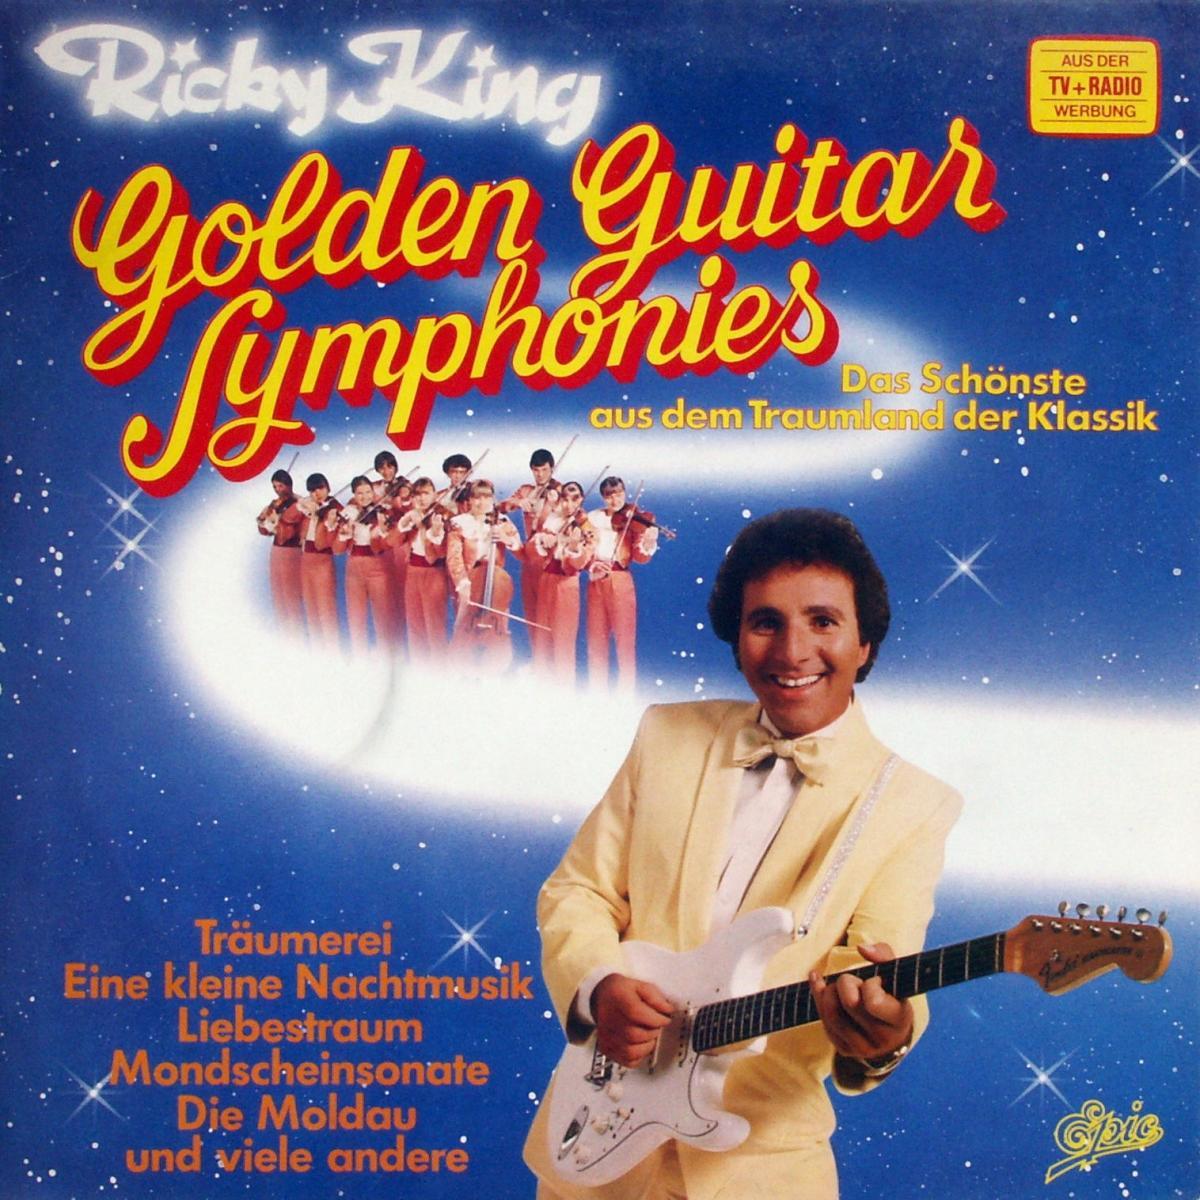 King, Ricky - Golden Guitar Symphonies [LP]